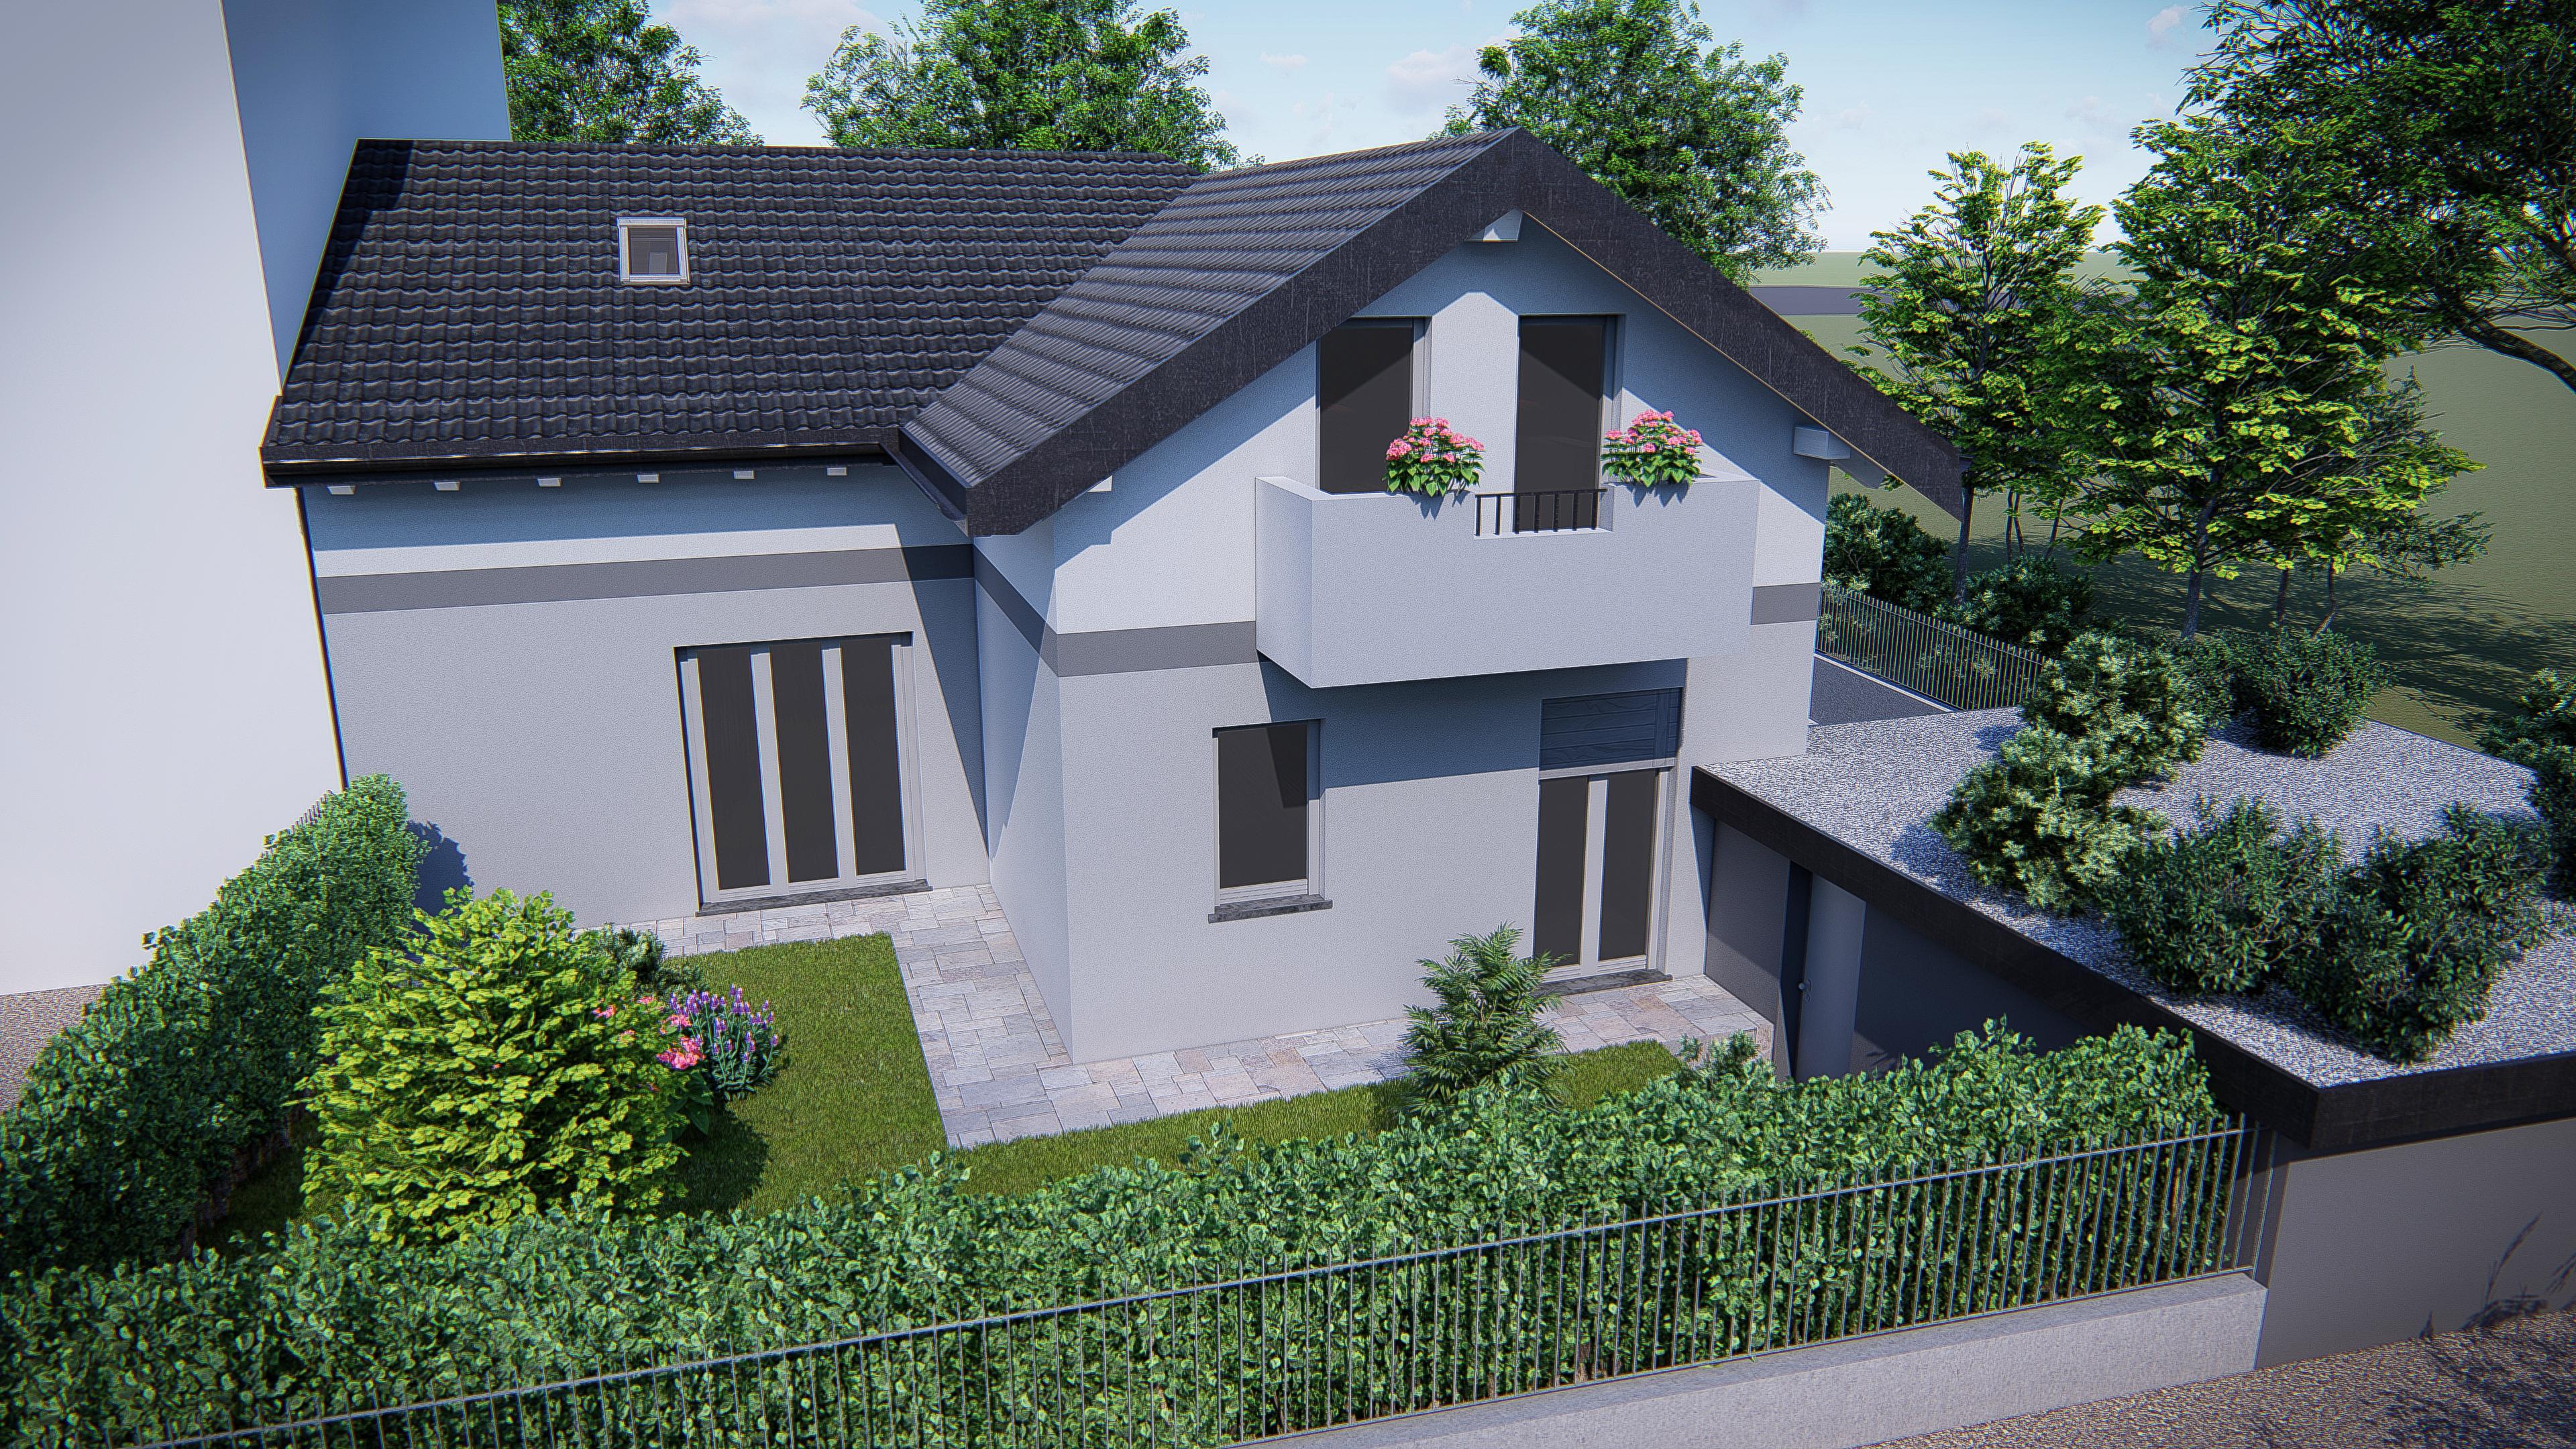 https://www.creocasa.net/property/villa-singola/